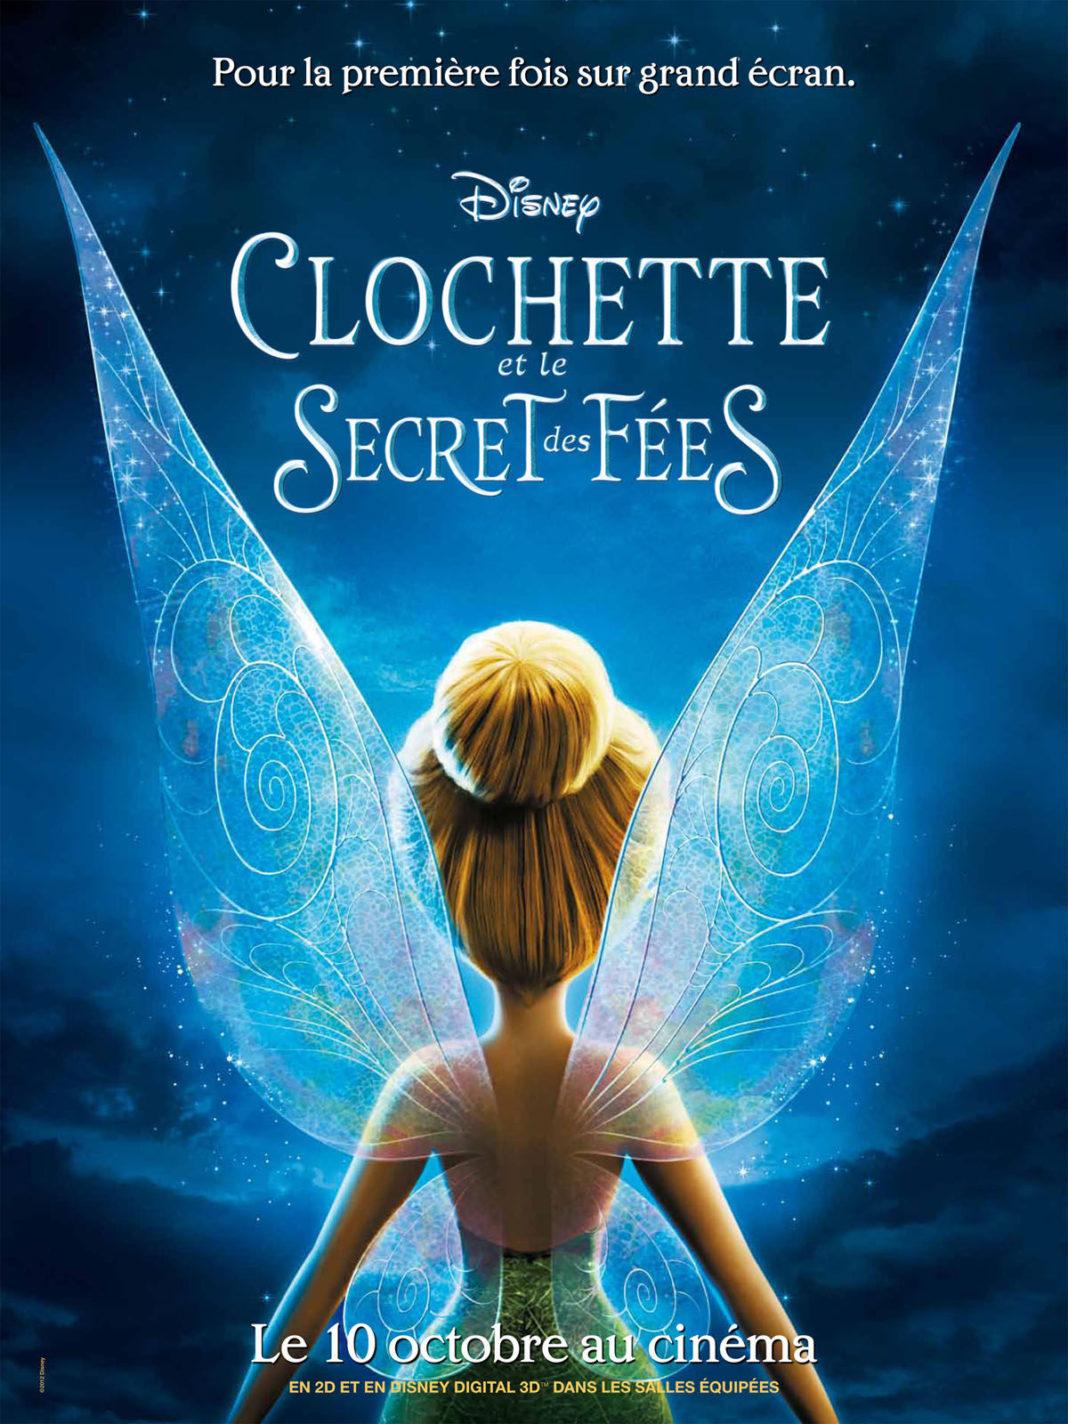 walt disney animation disneytoon studios affiche clochette secret fees poster secret wings